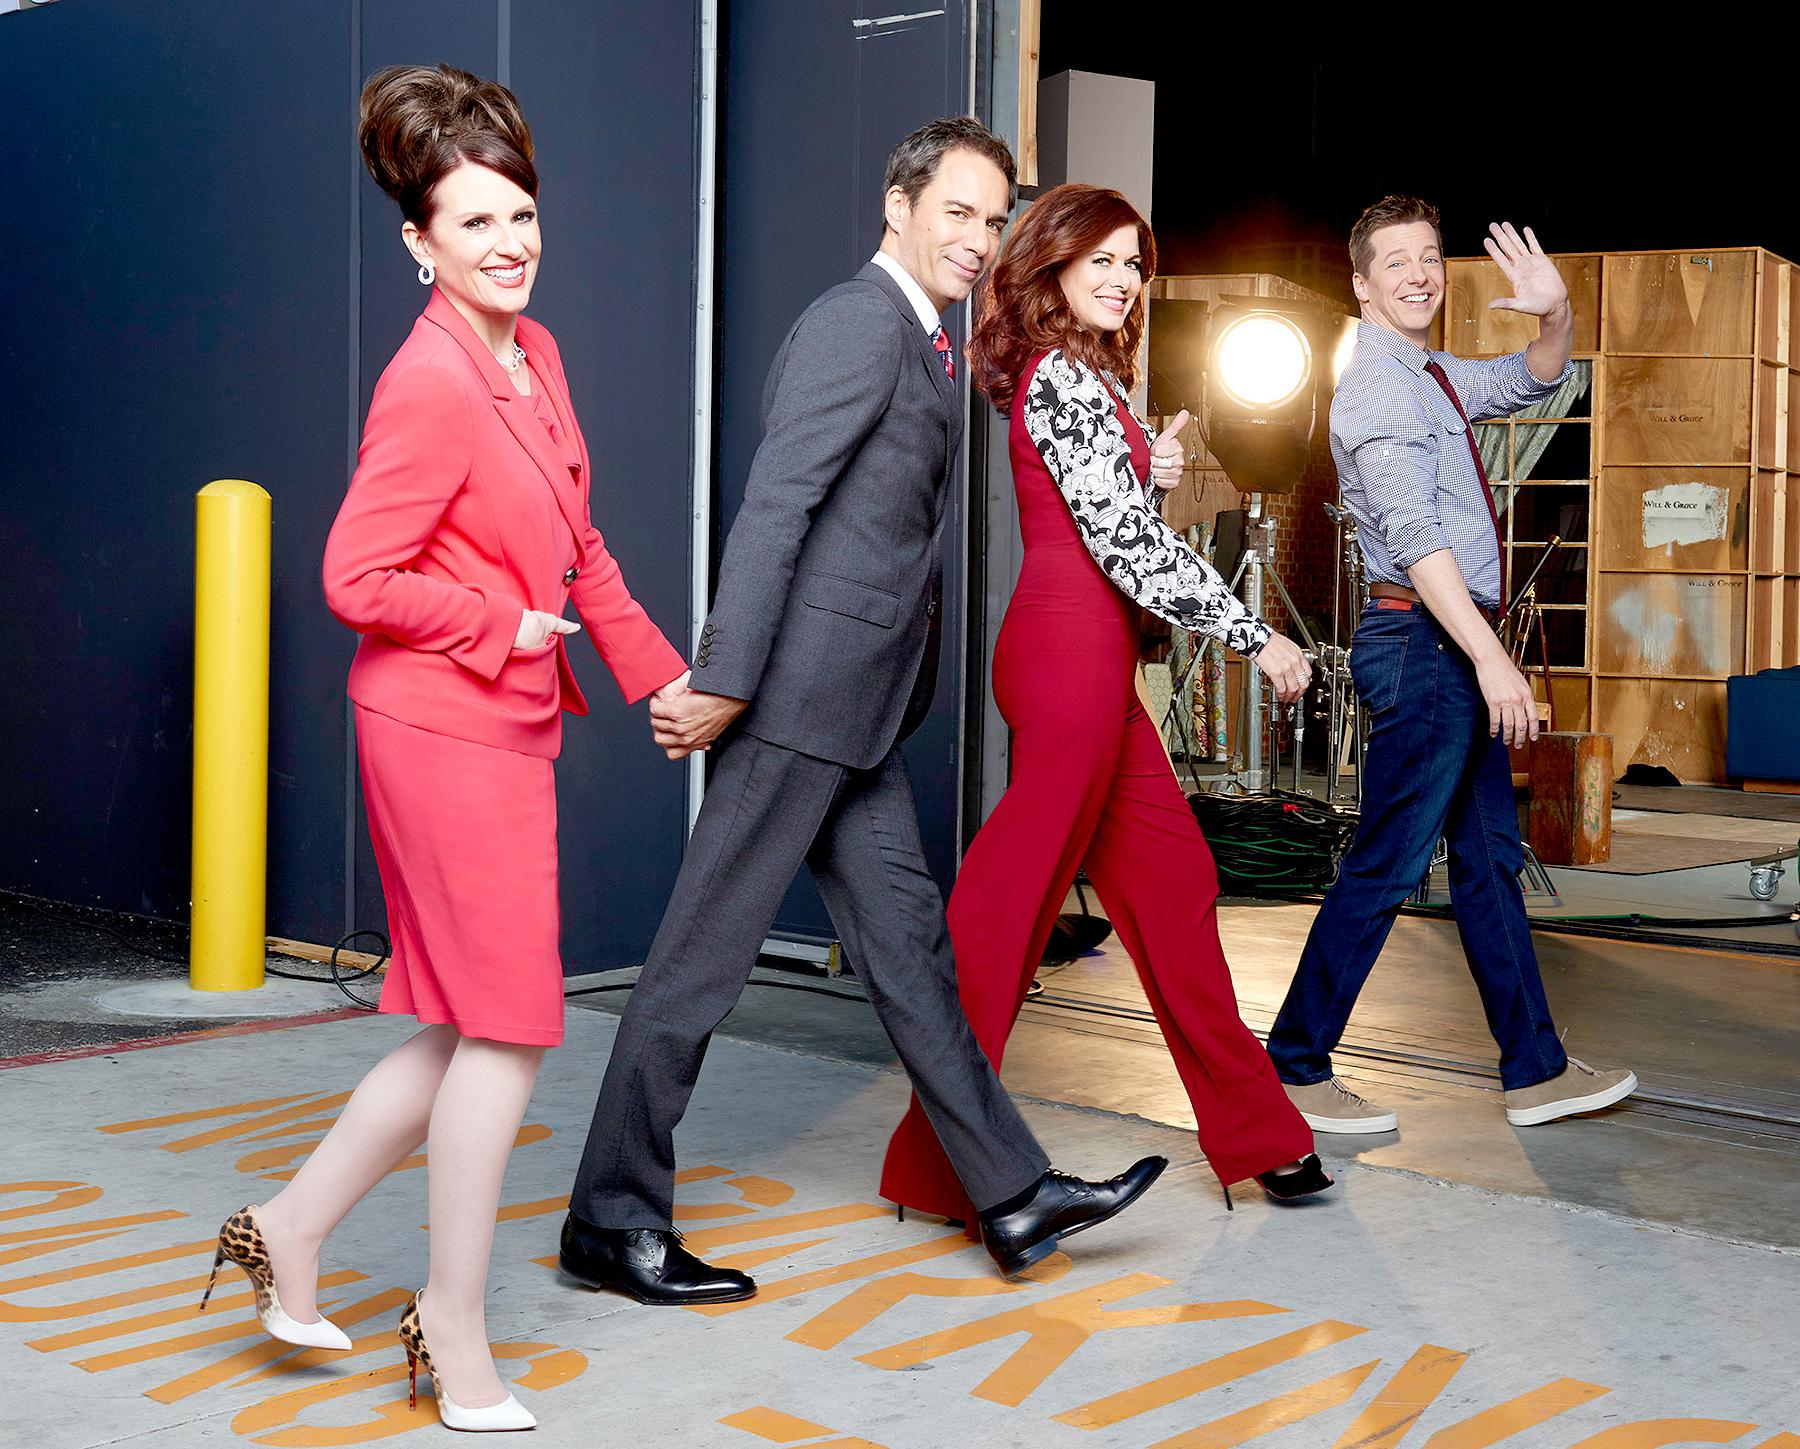 Megan Mullally as Karen Walker, Eric McCormack as Will Truman, Debra Messing as Grace Adler, Sean Hayes as Jack McFarland